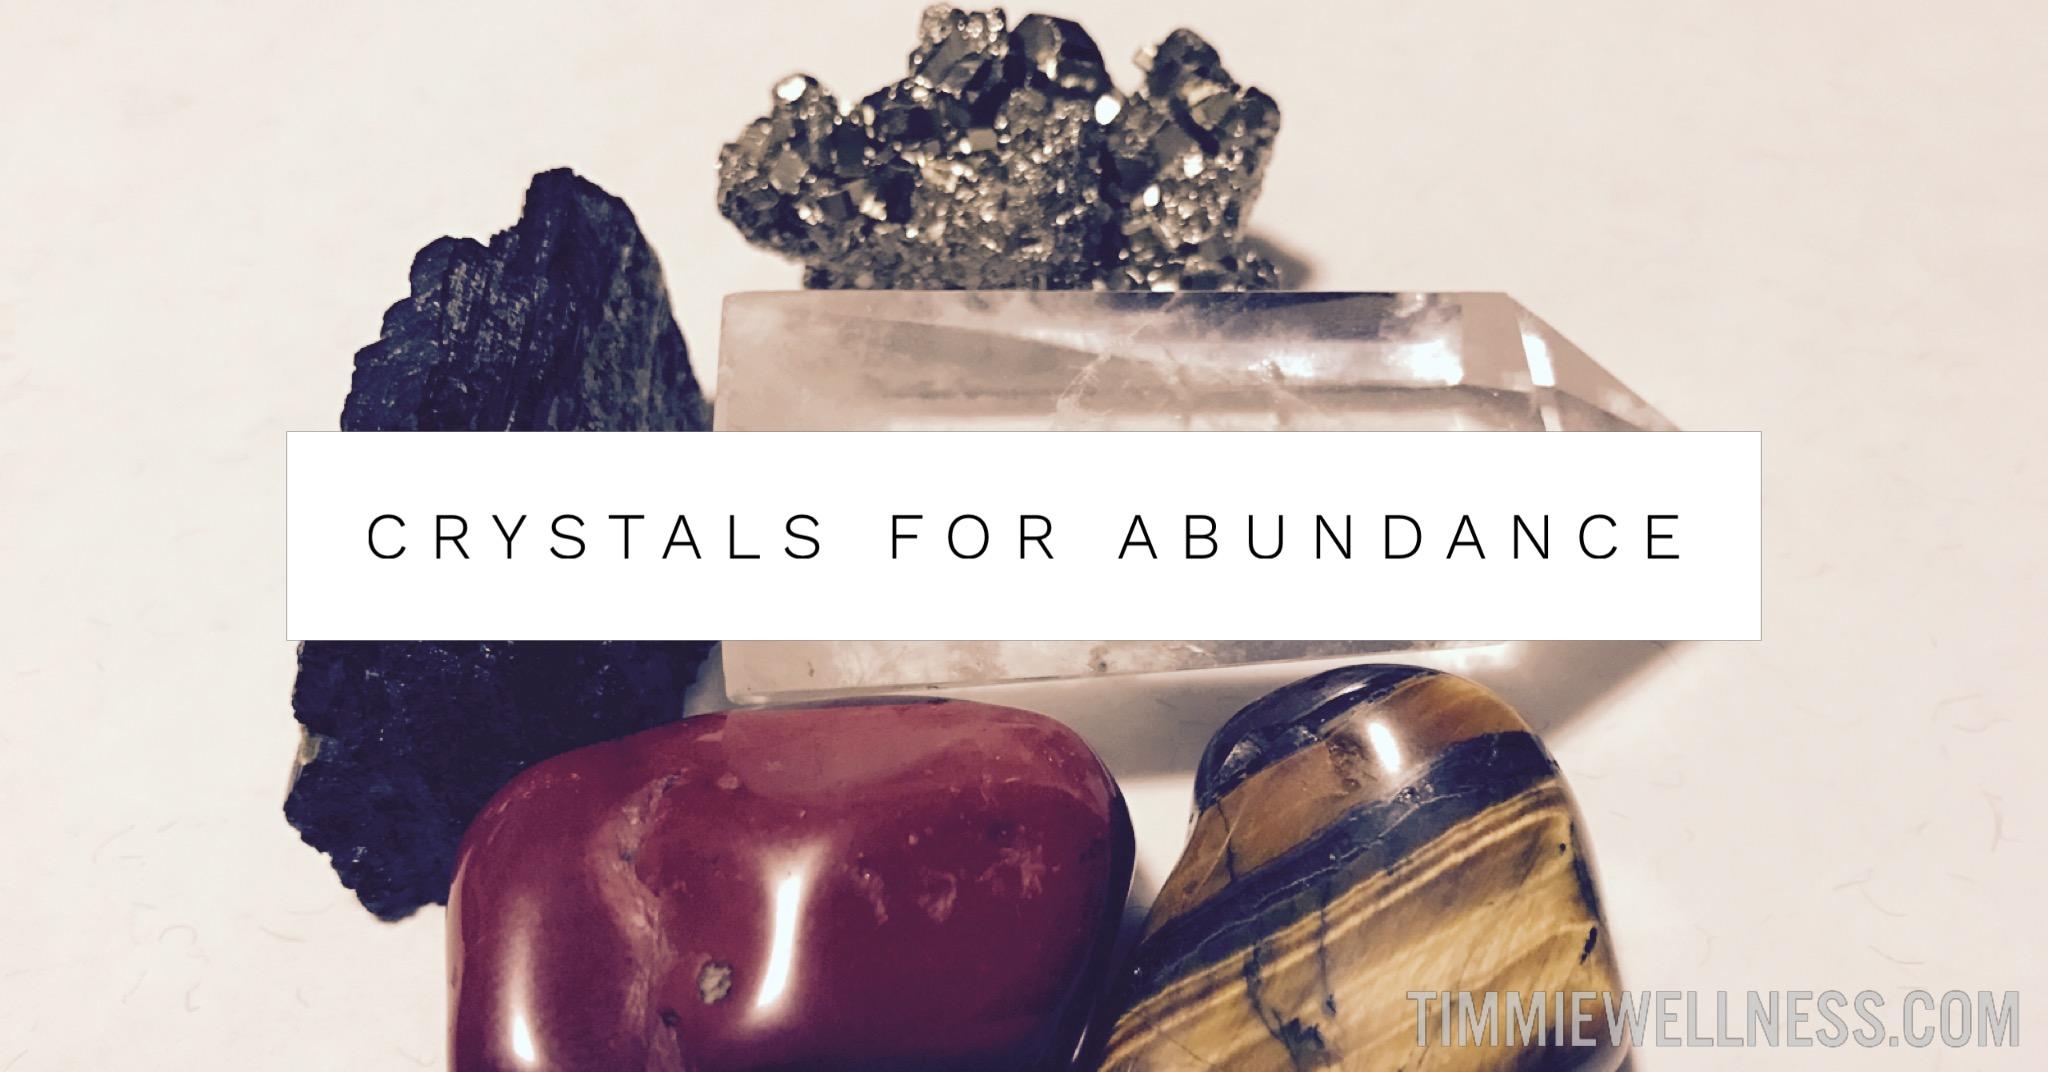 Crystals for Abundance by Timmie Horvath Policarpio Wanechko Aromatherapist Edmonton Reiki Training Crystal Healing Certification